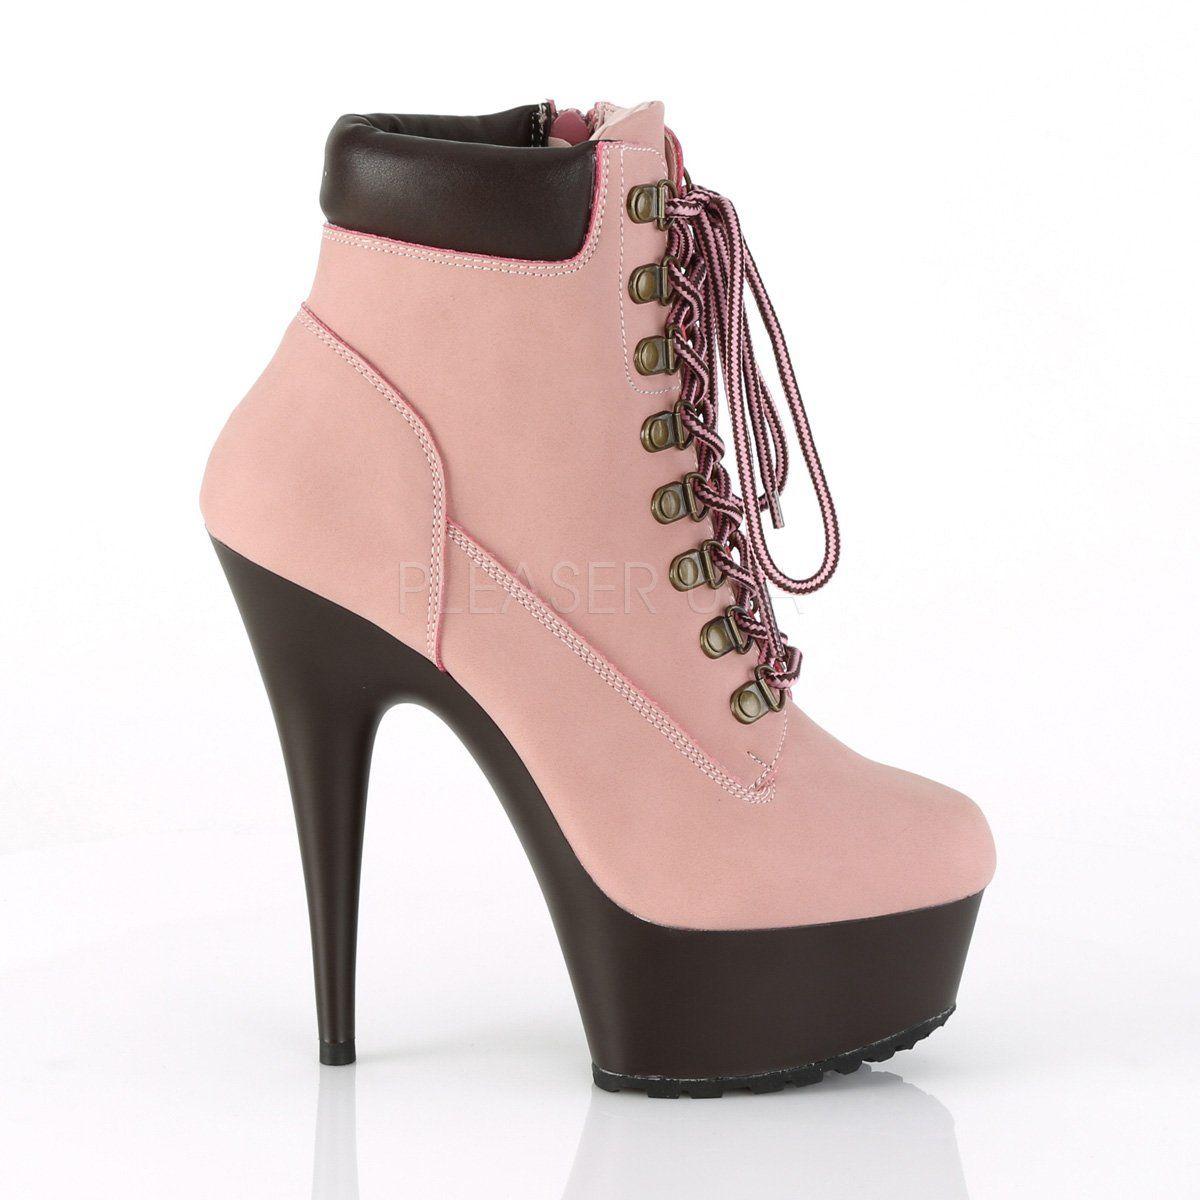 399d7cea855 ... Totally Wicked Footwear. Delight 600tl-2 Pink Nubuck Work Style 6